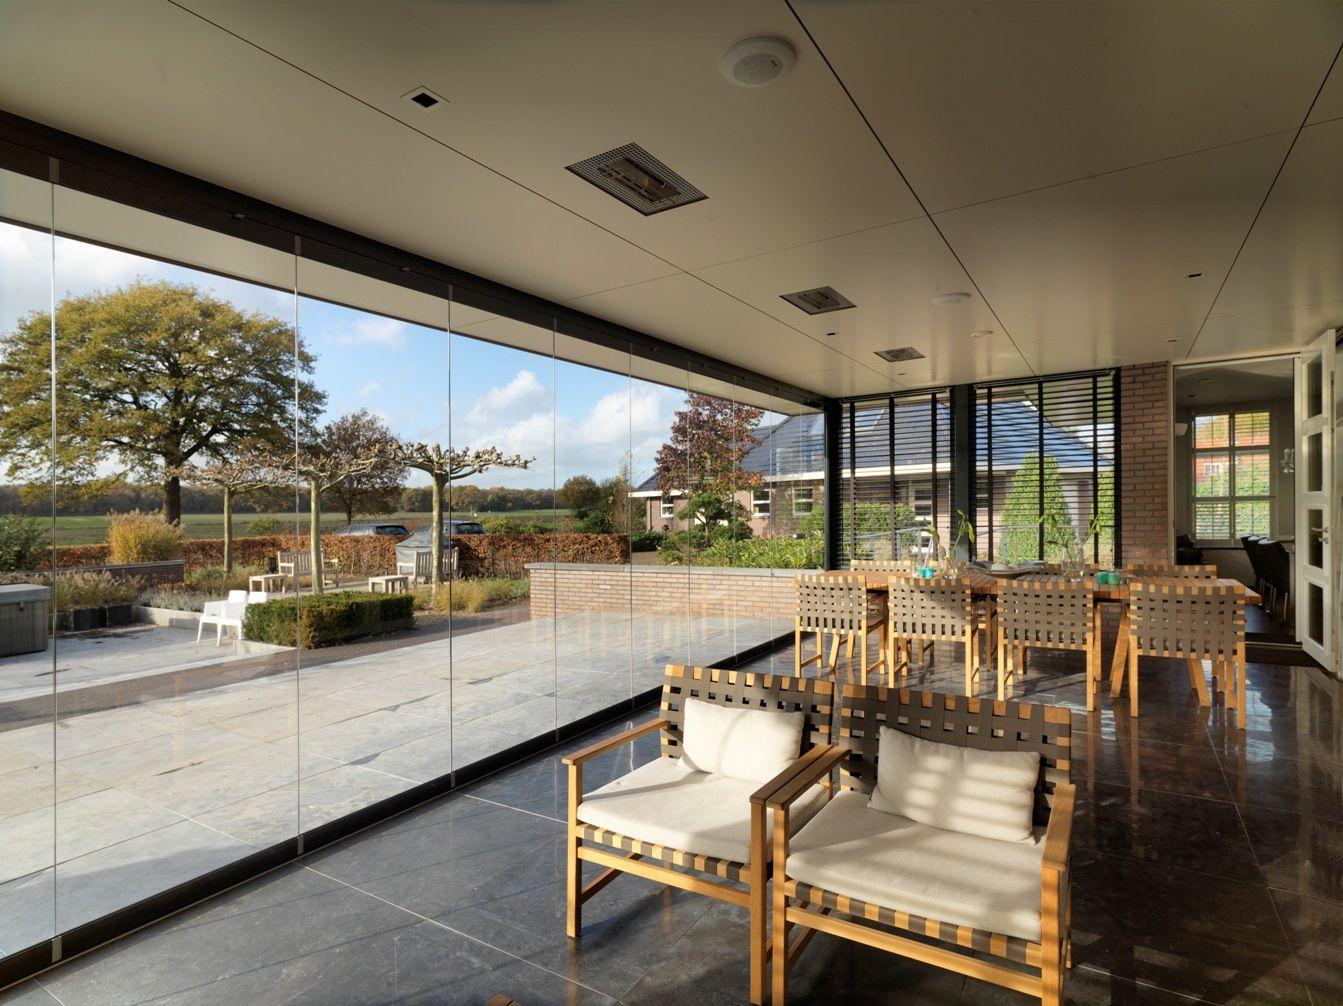 glazen vouwwand solarlux sl 25 om de veranda wind en waterdicht te maken. Black Bedroom Furniture Sets. Home Design Ideas